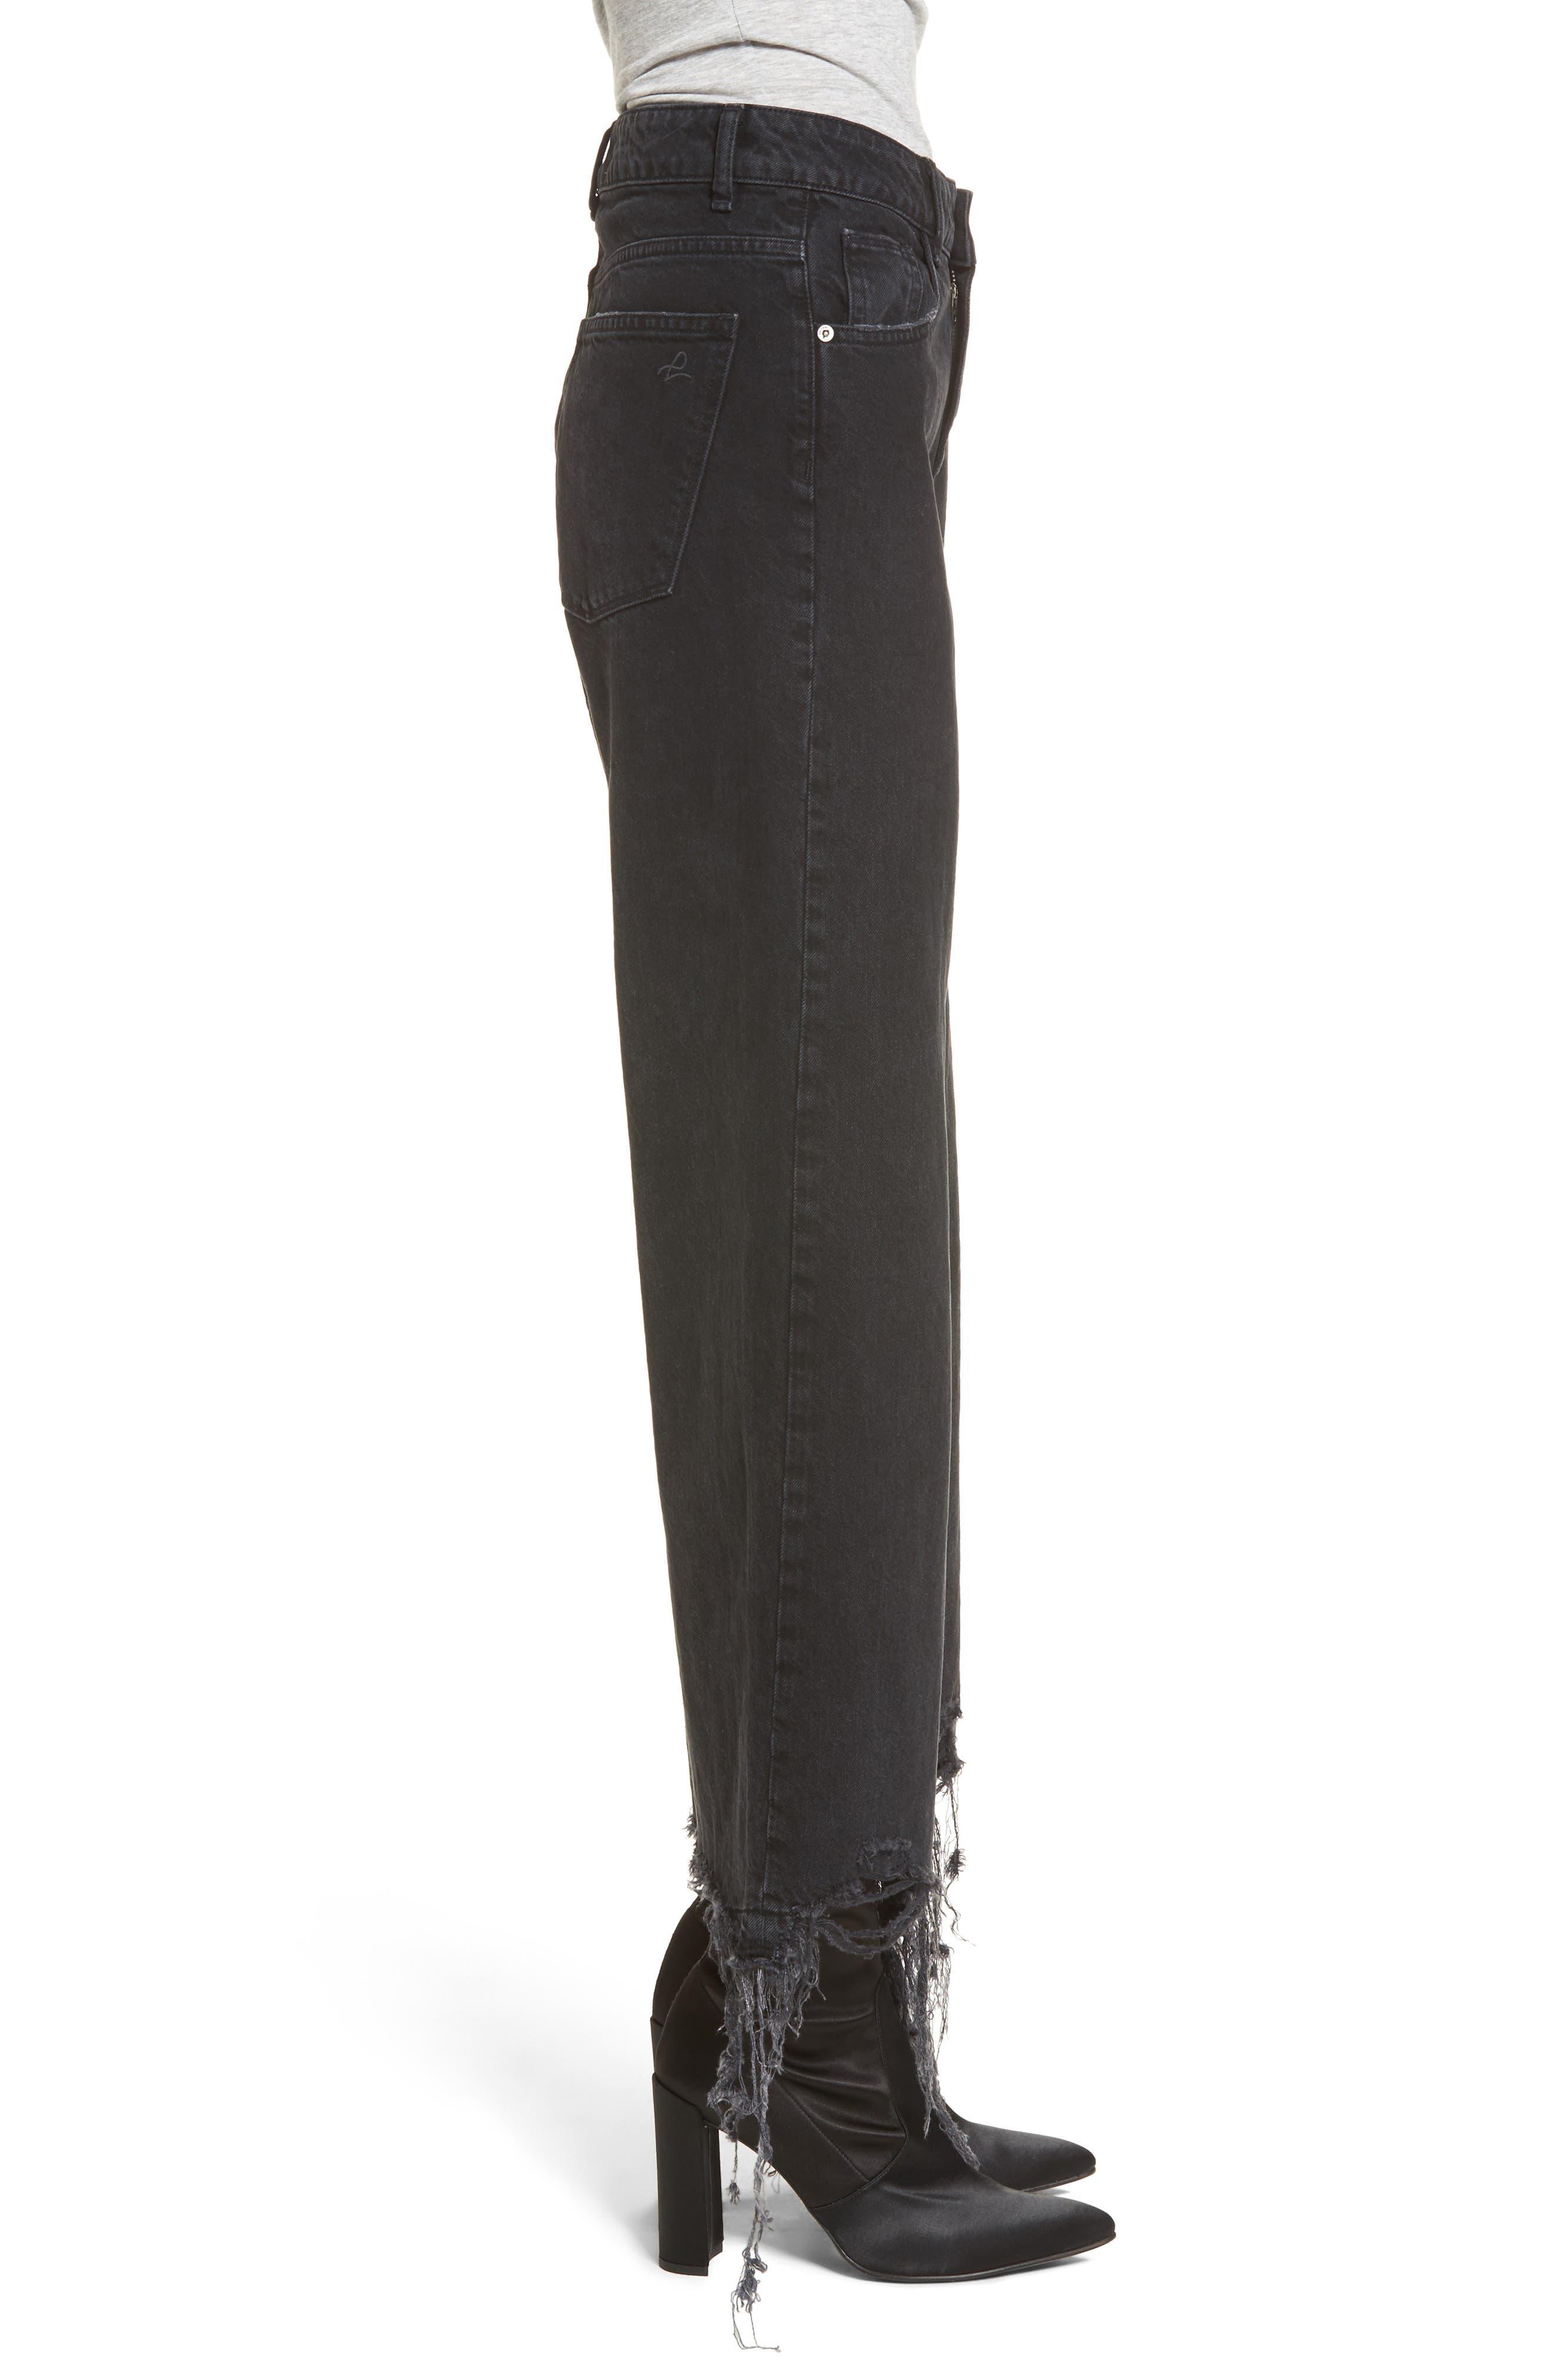 Hepburn High Waist Wide Leg Jeans,                             Alternate thumbnail 3, color,                             Savannah Destroy